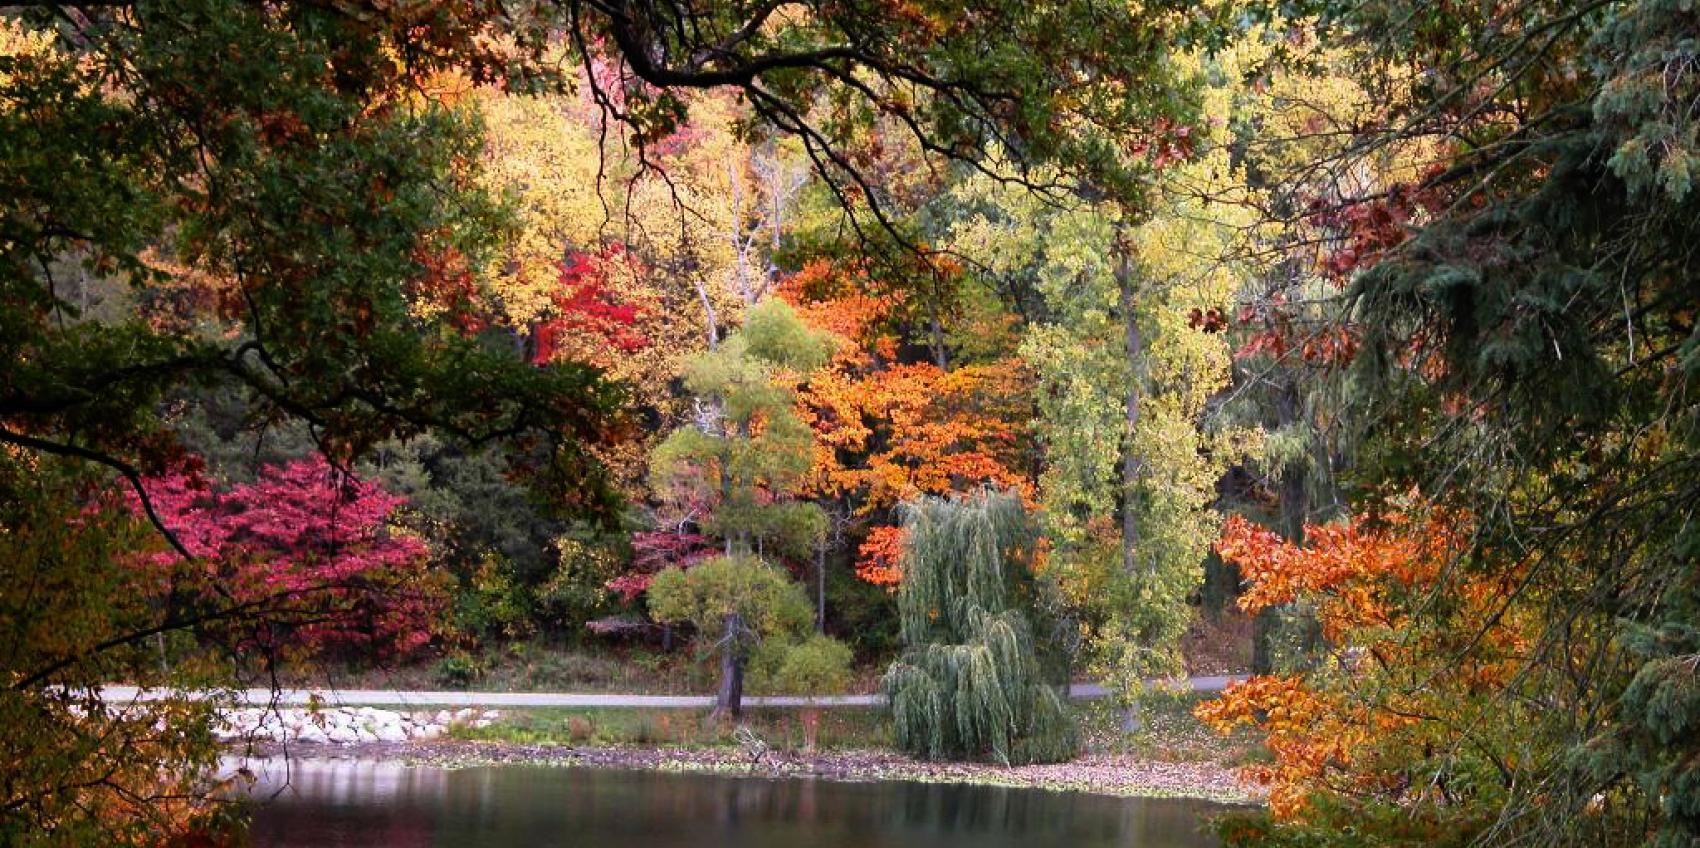 Hidden Lake Gardens | American Public Gardens Association